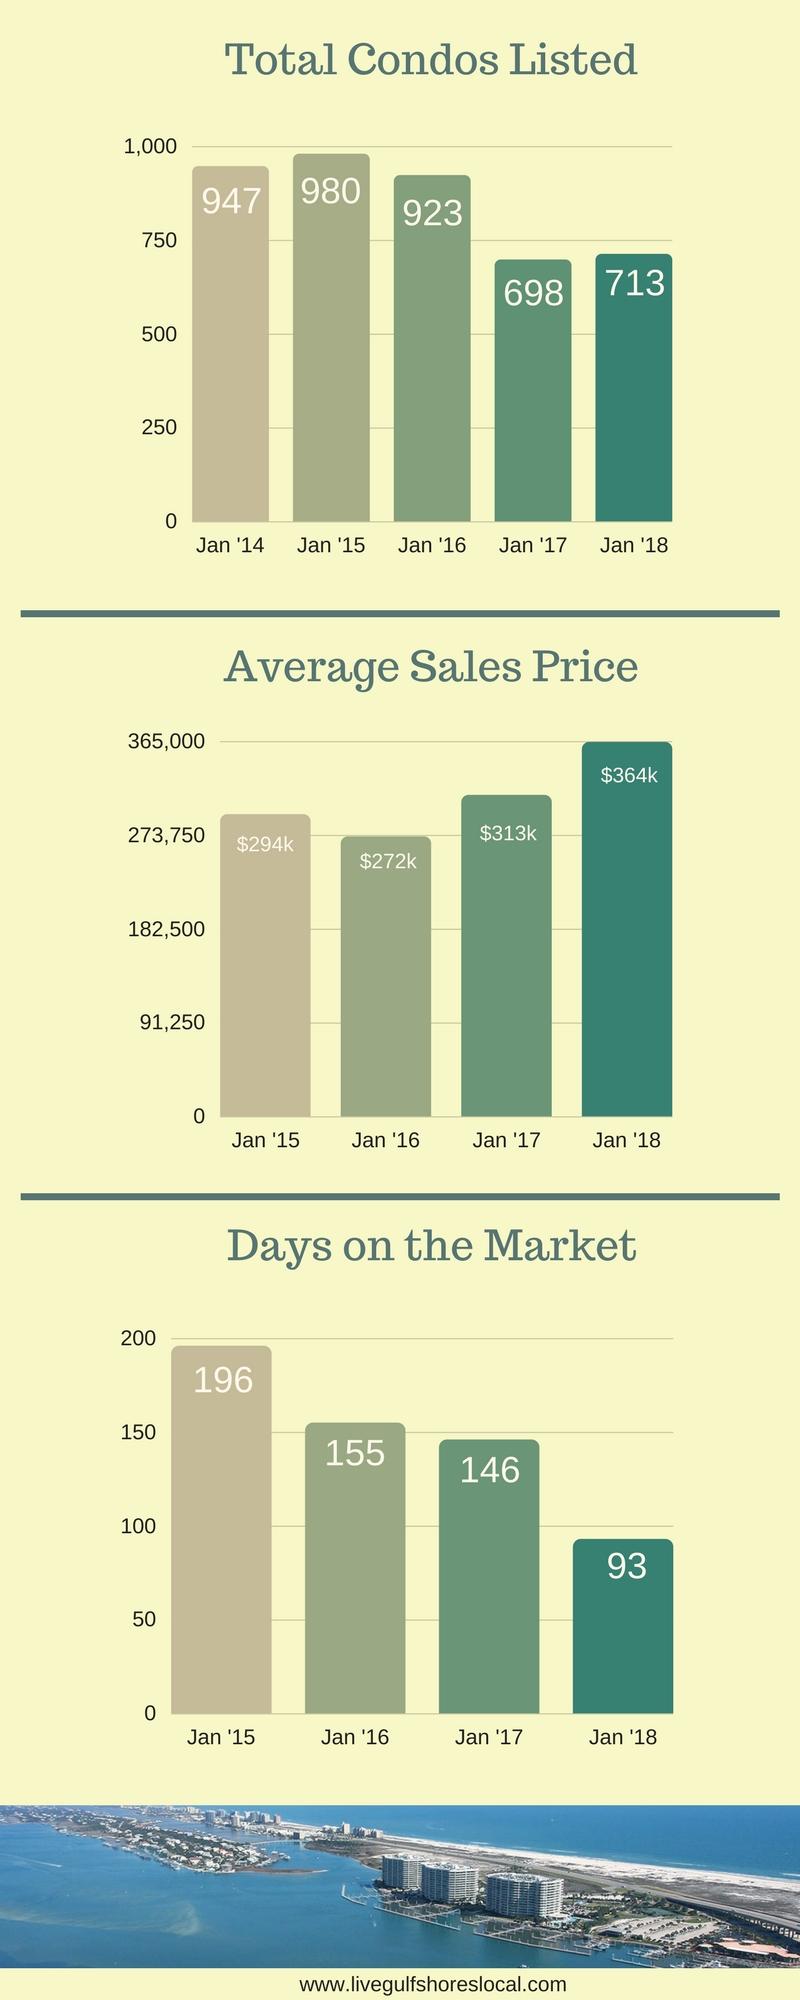 Alabama Gulf Coast Condo Sales